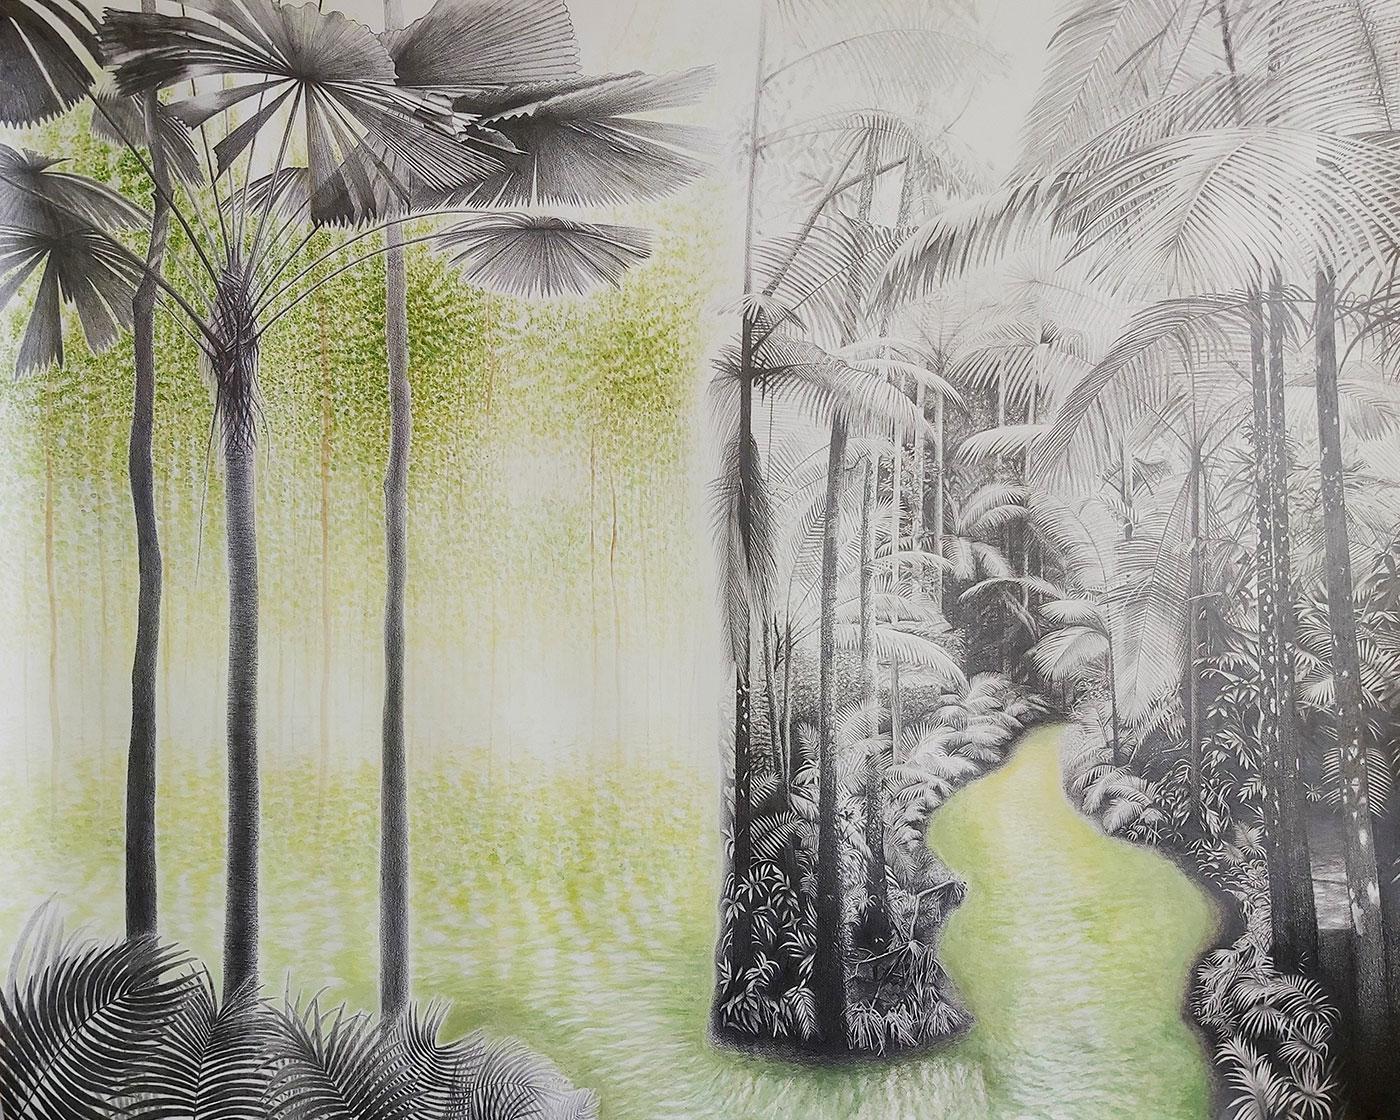 Judit Prieto drawing